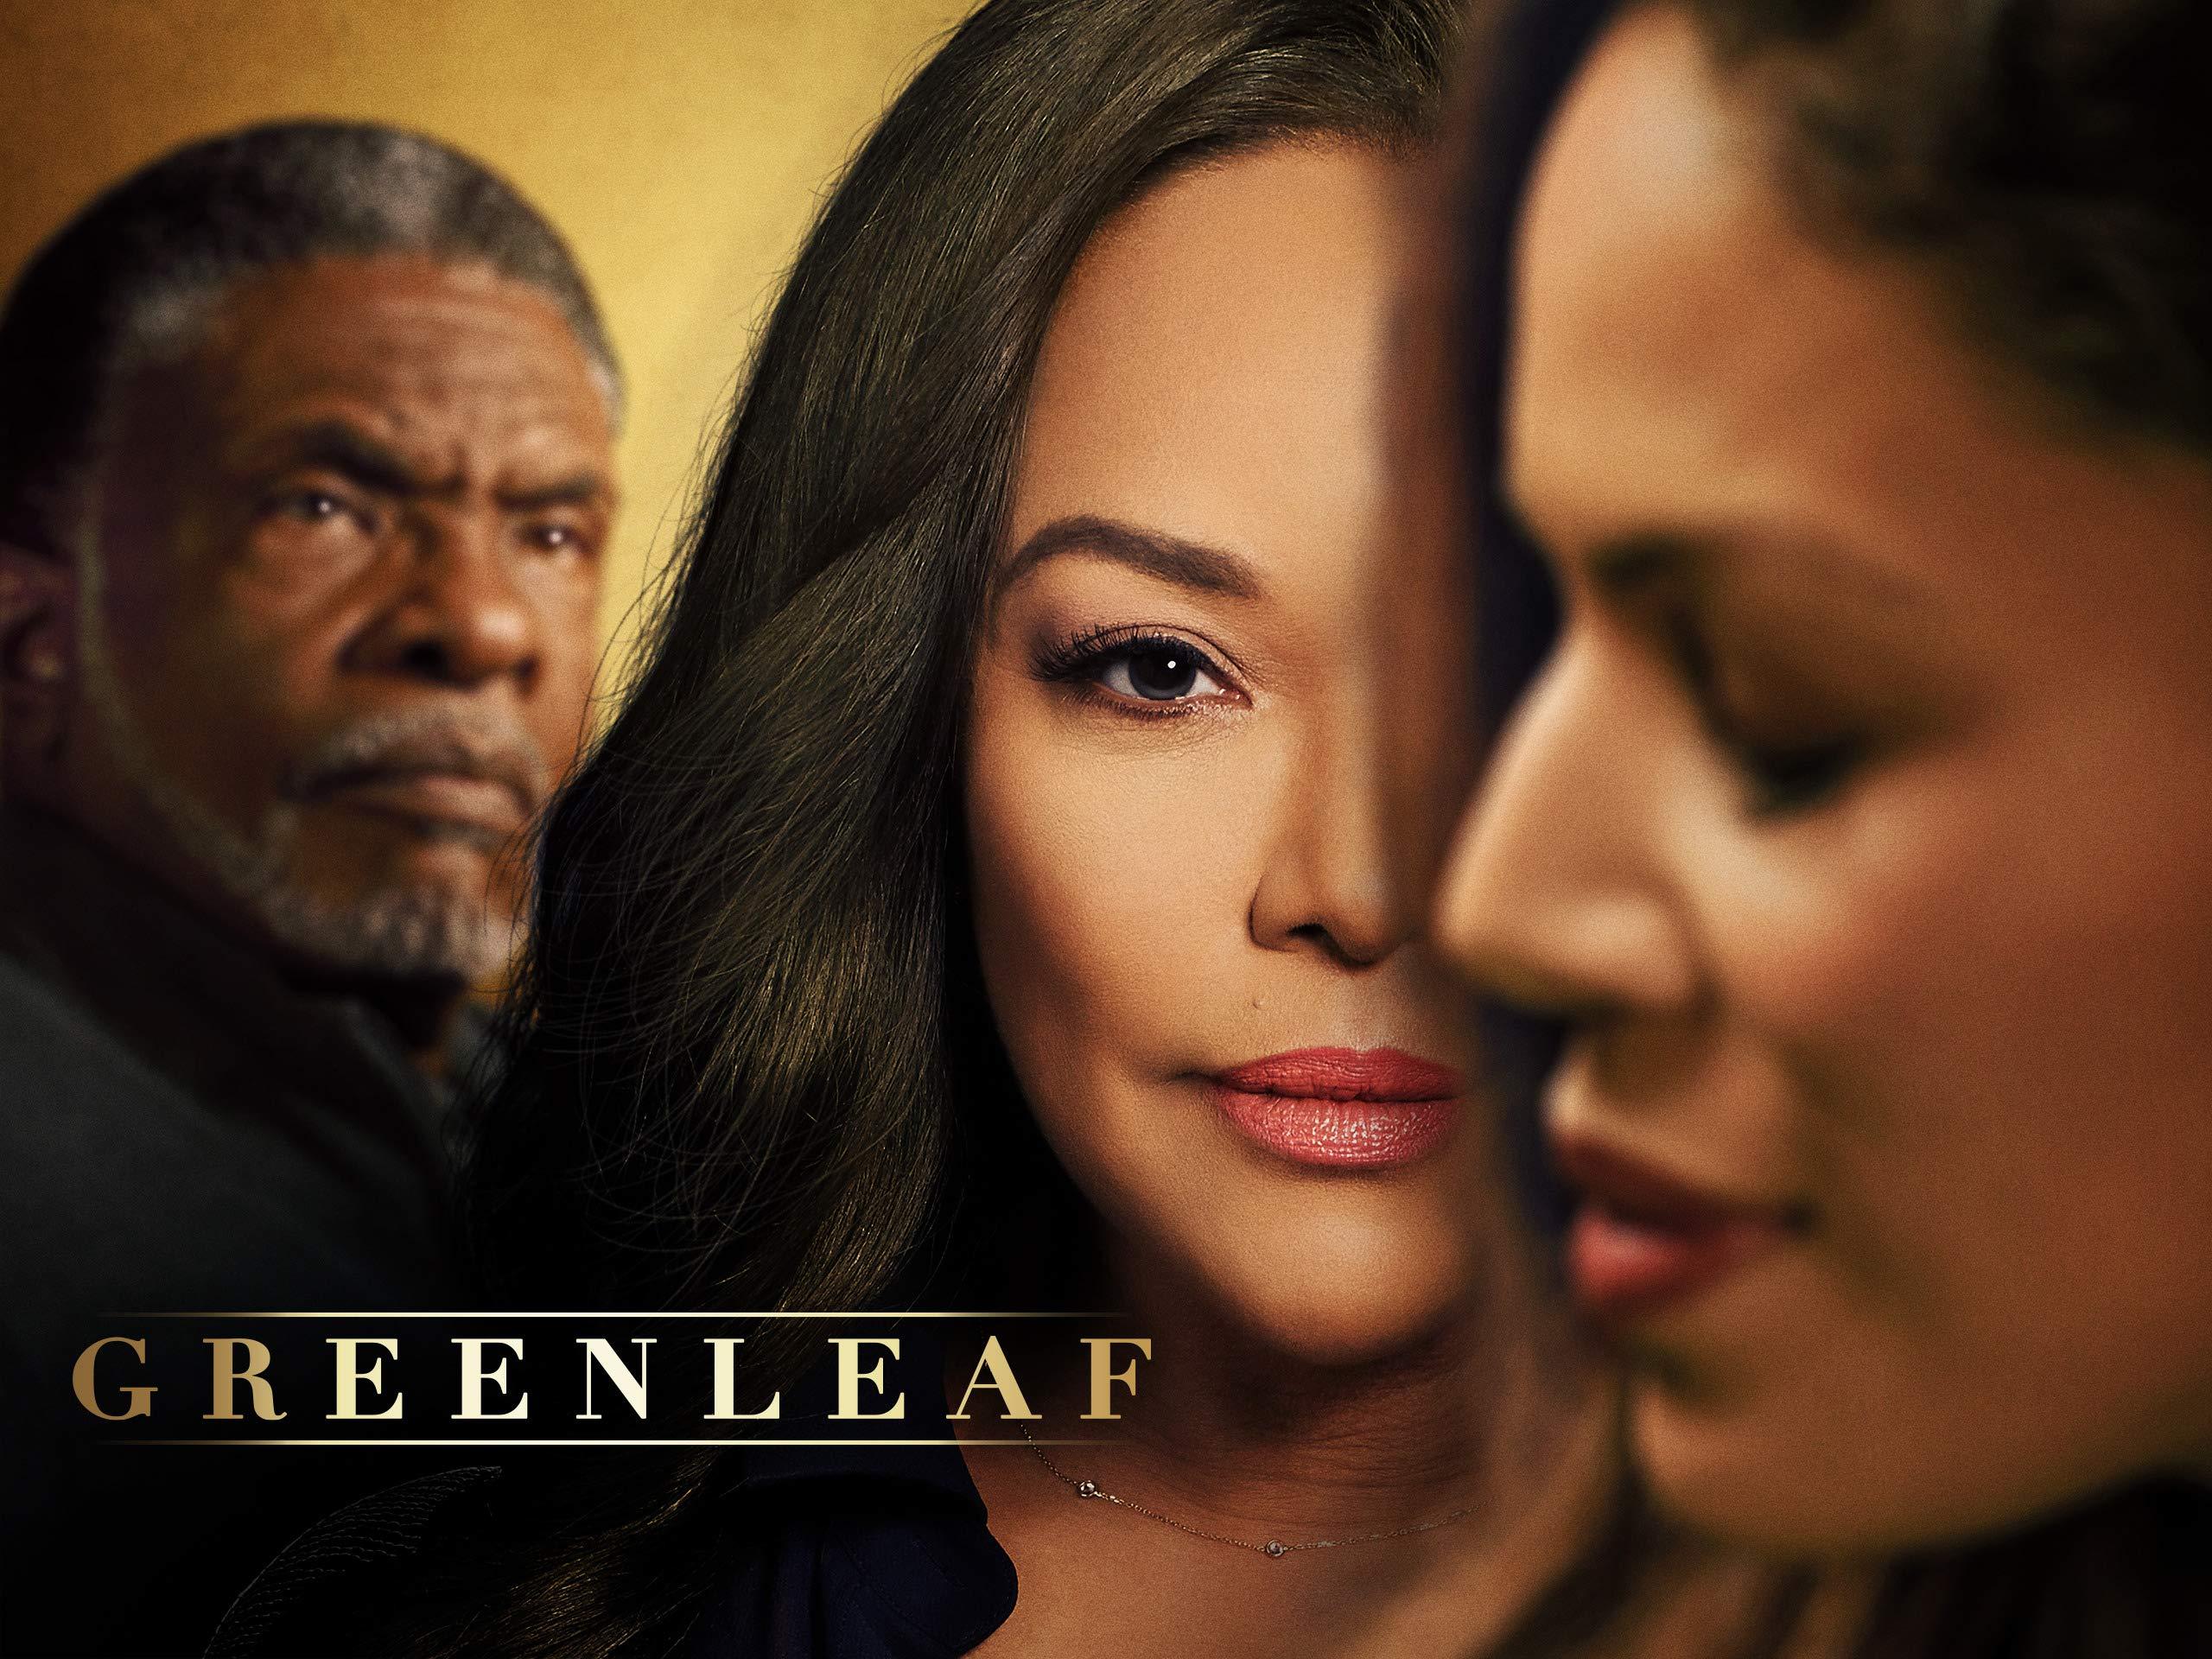 watch greenleaf season 1 episode 1 free